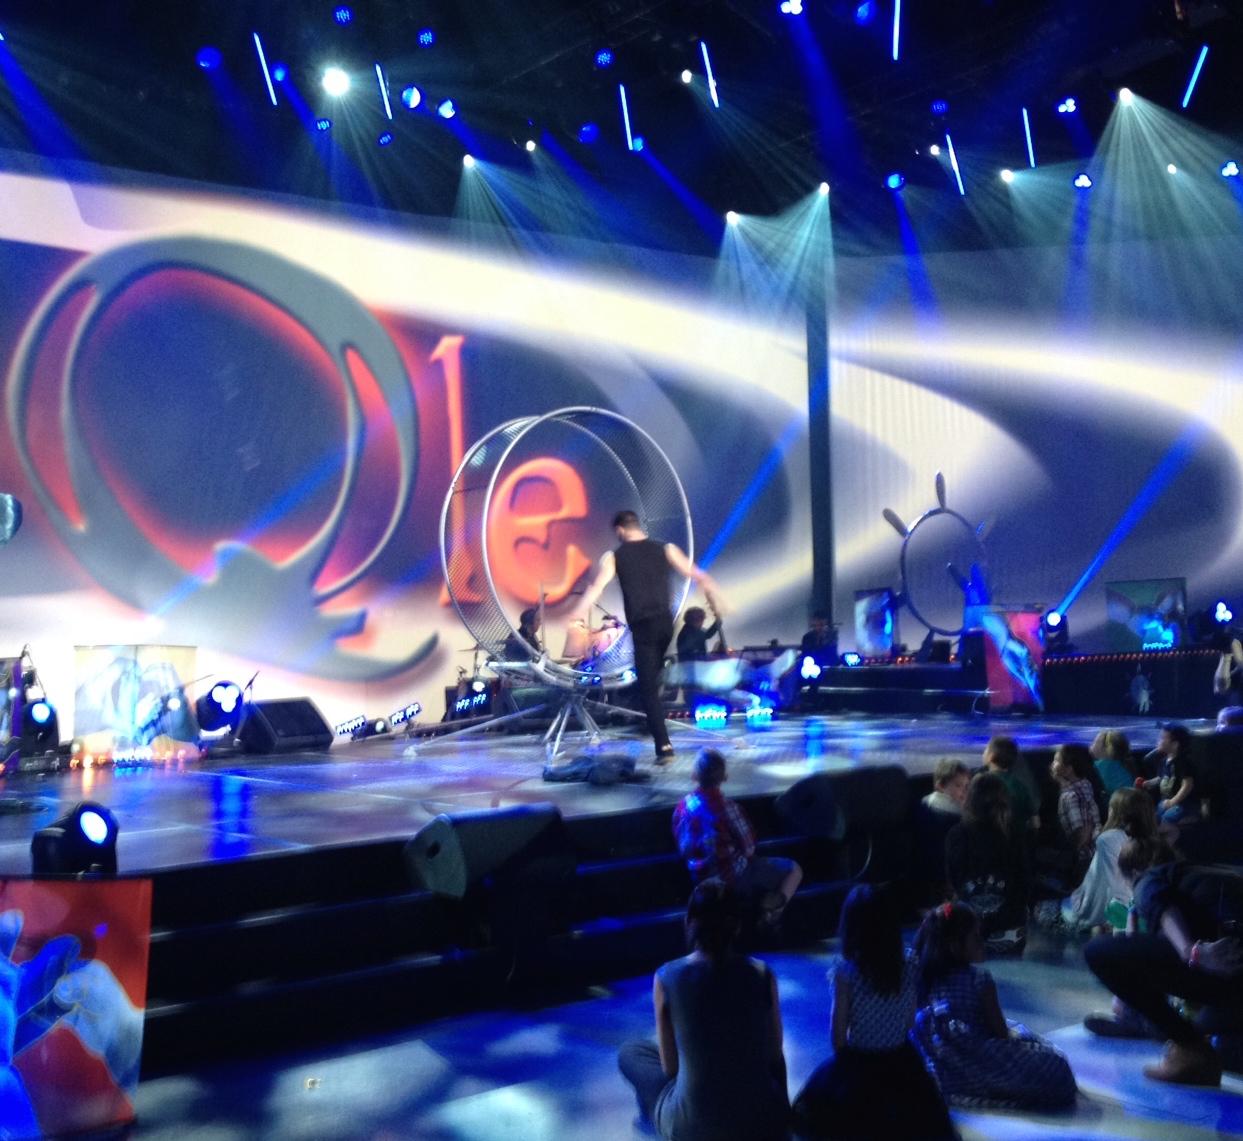 Performance on Operation Enfant Soleil telethon